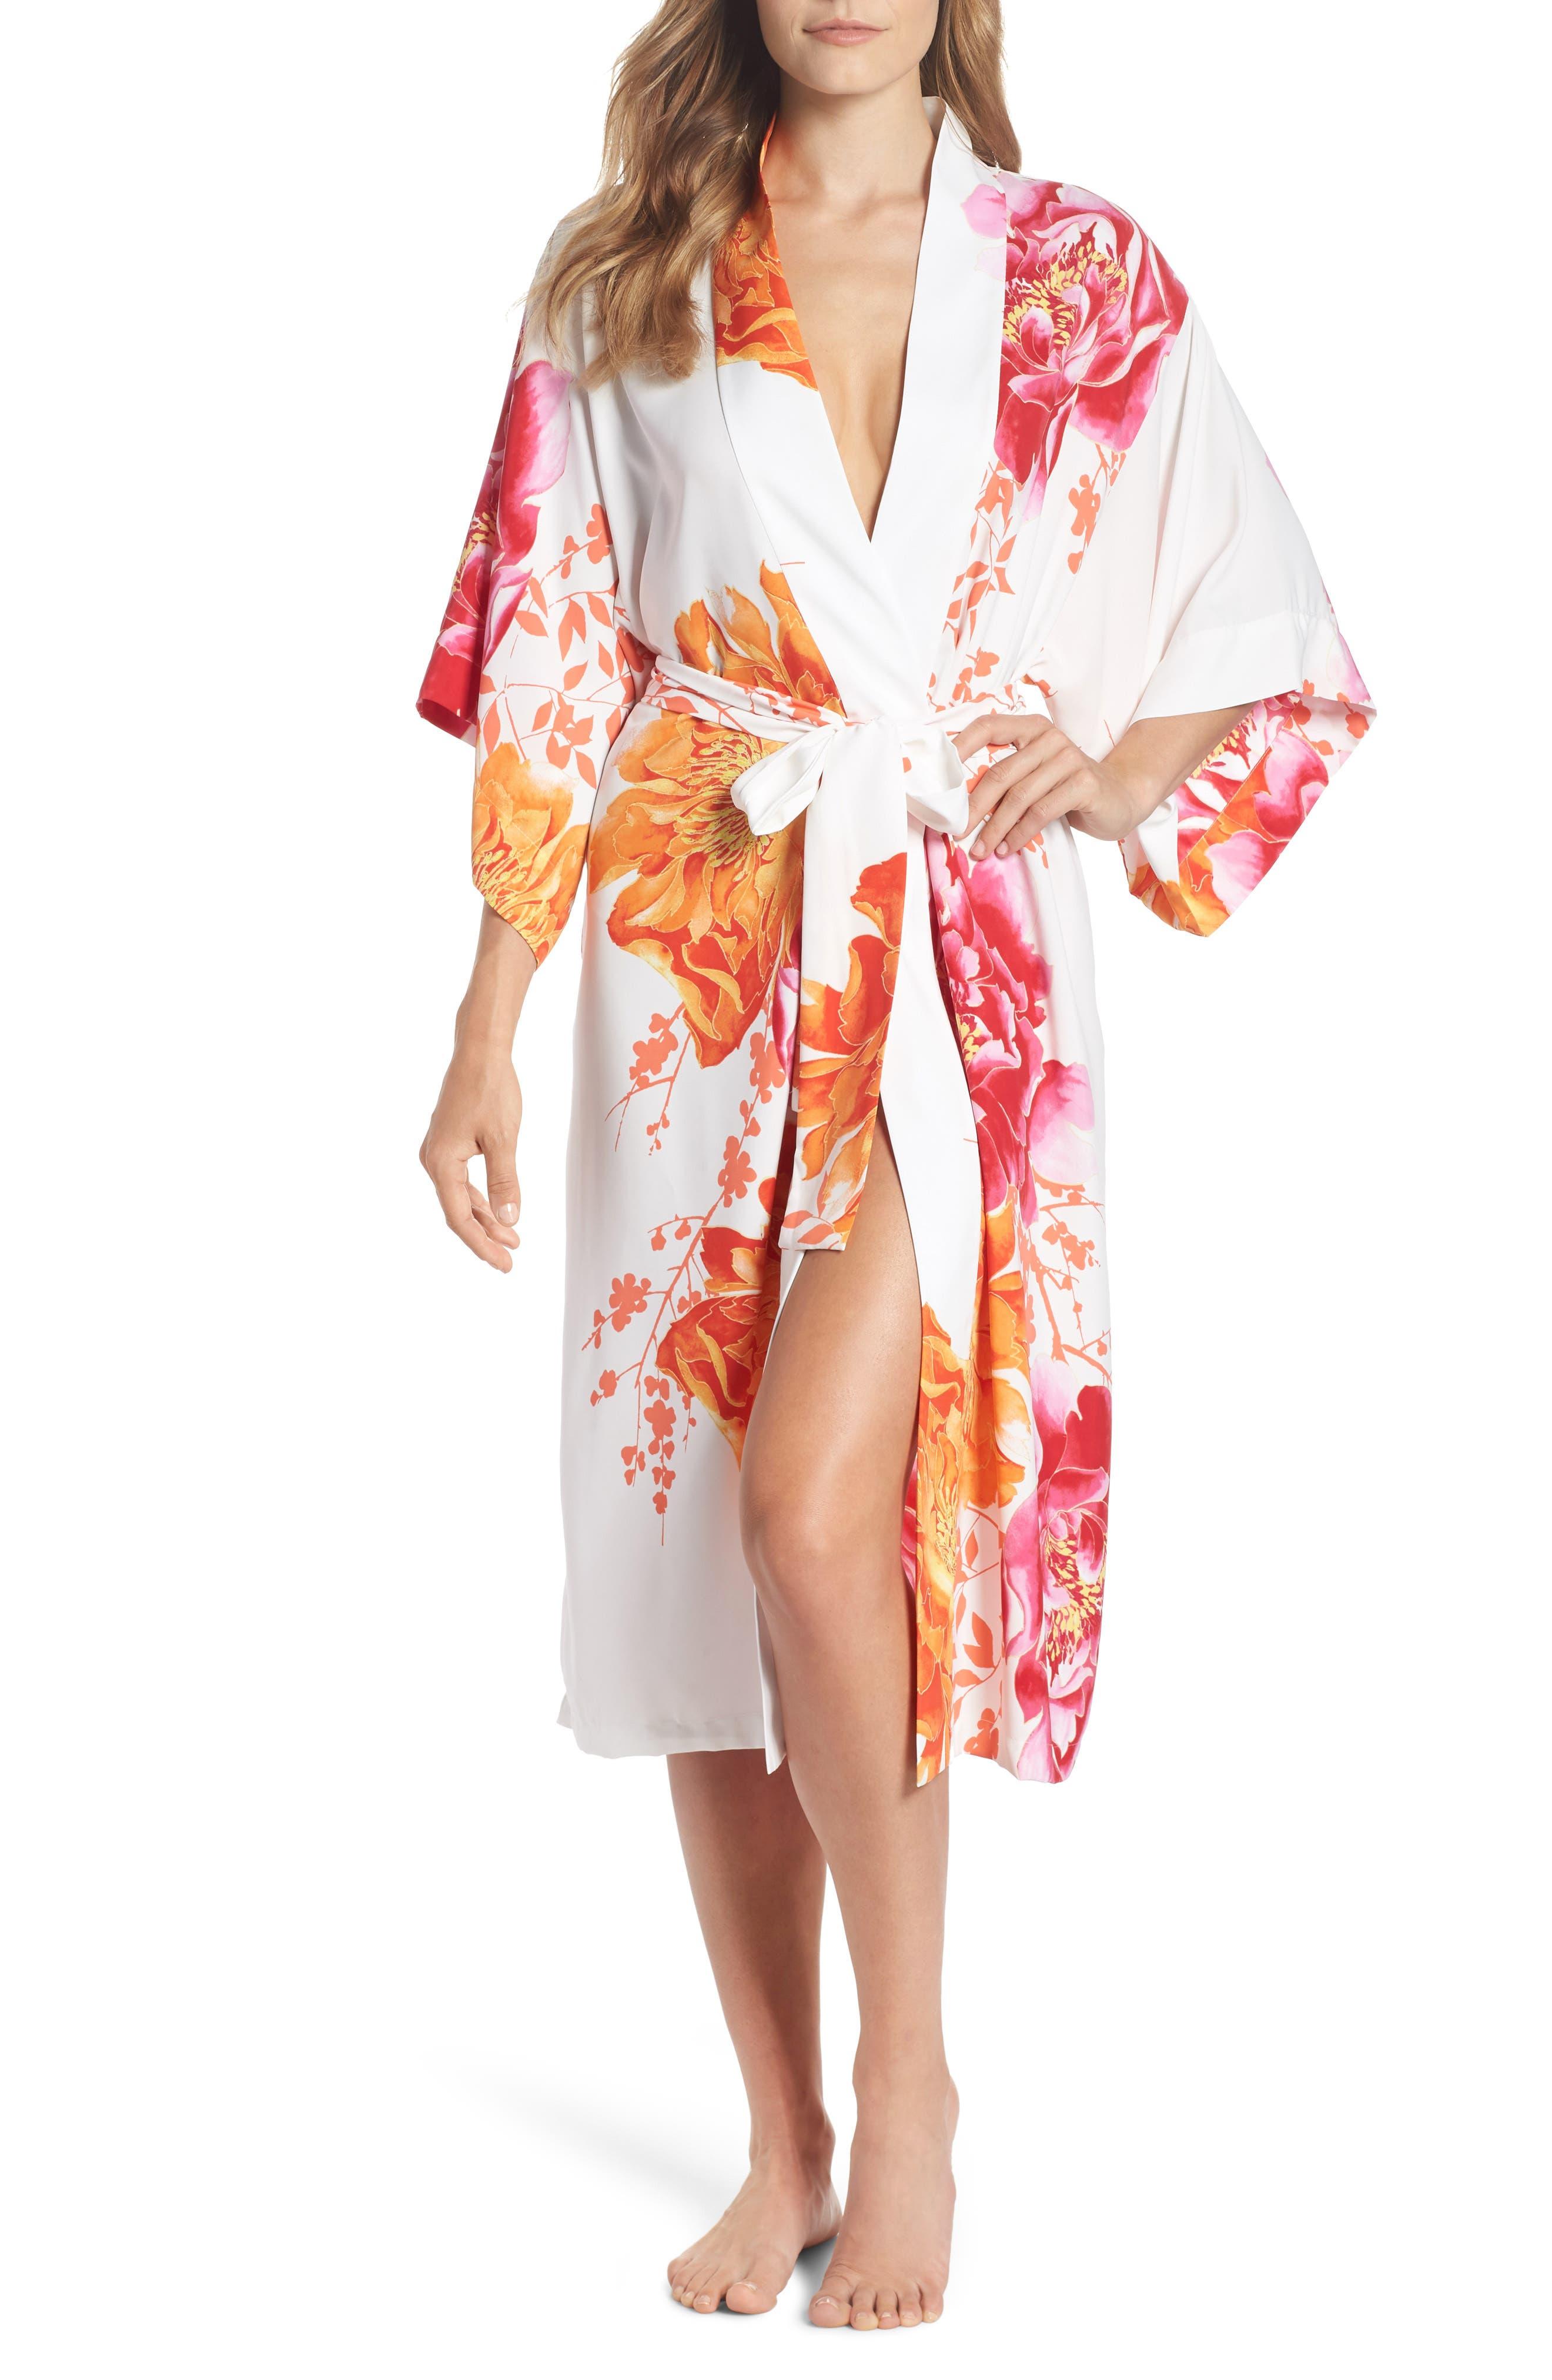 Bali Floral Print Robe,                             Main thumbnail 1, color,                             Warm White